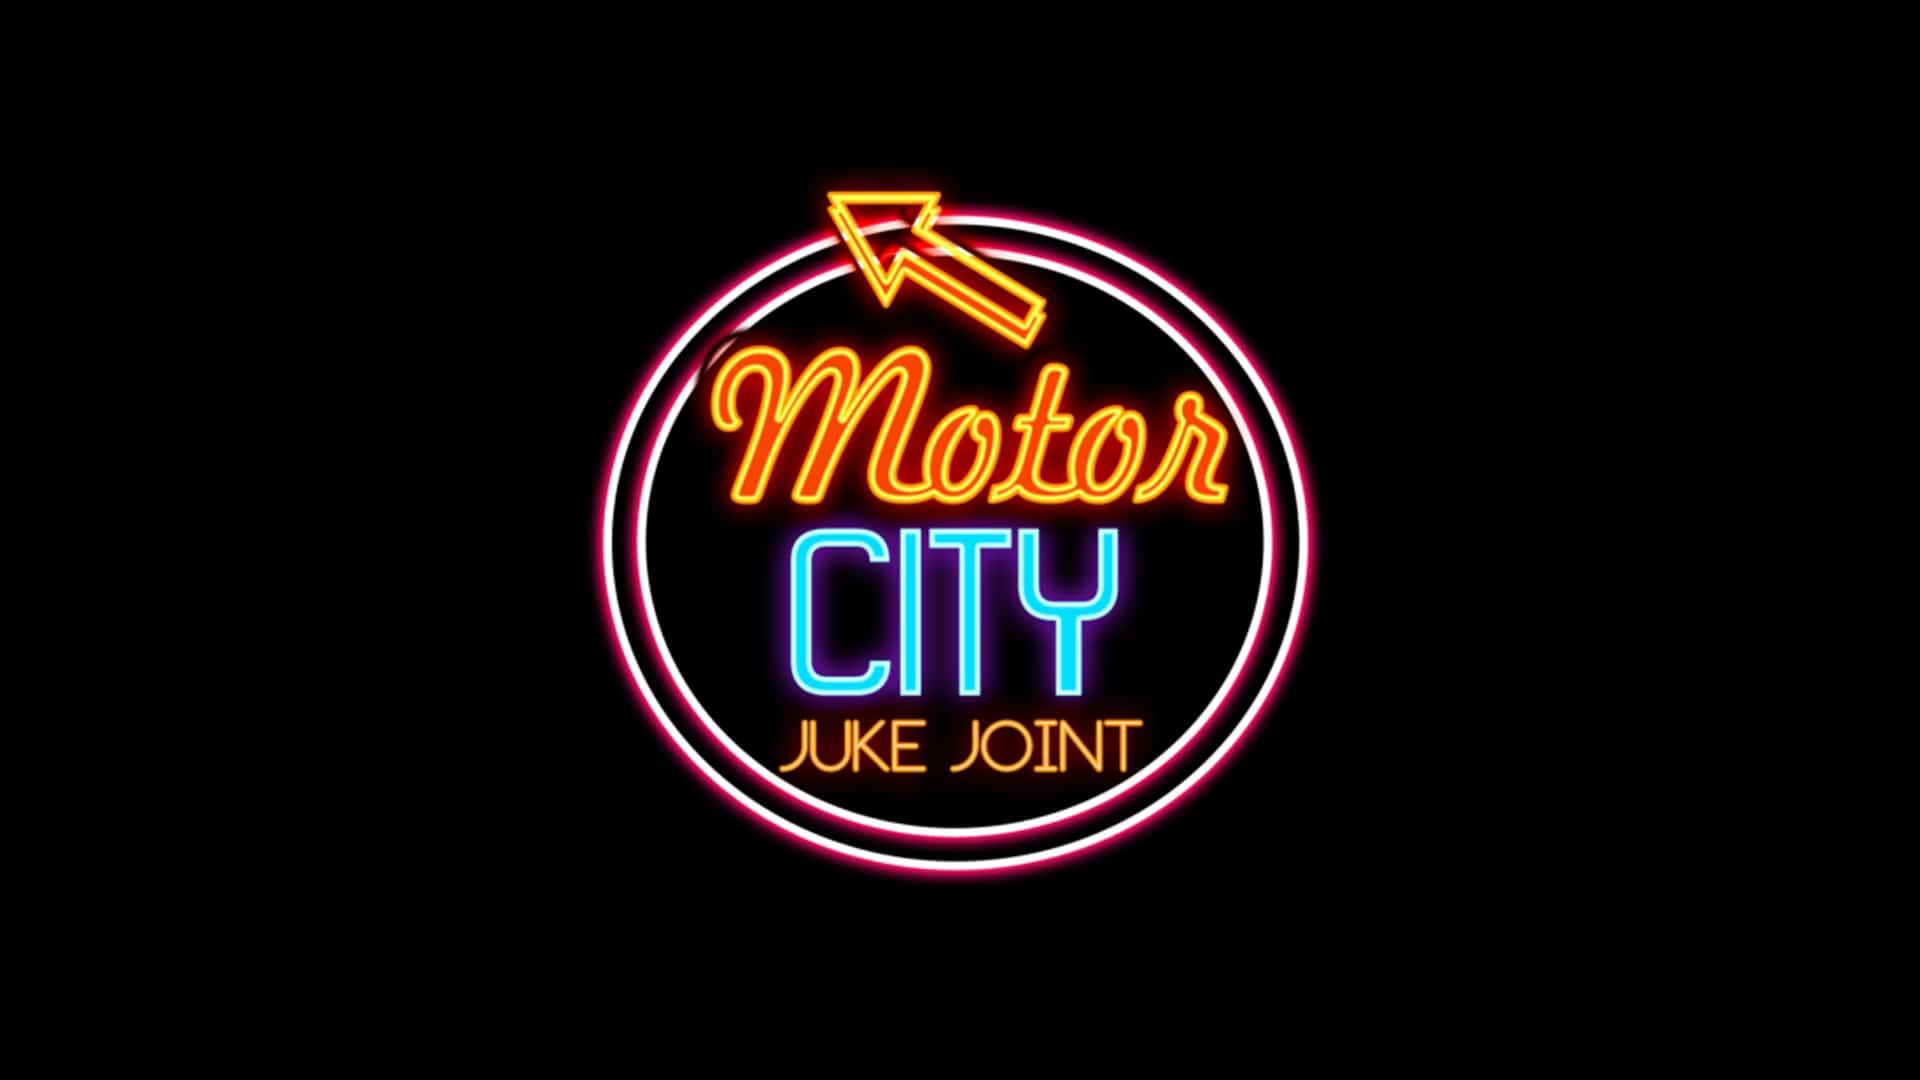 Motor City Juke Joint - Episode 231